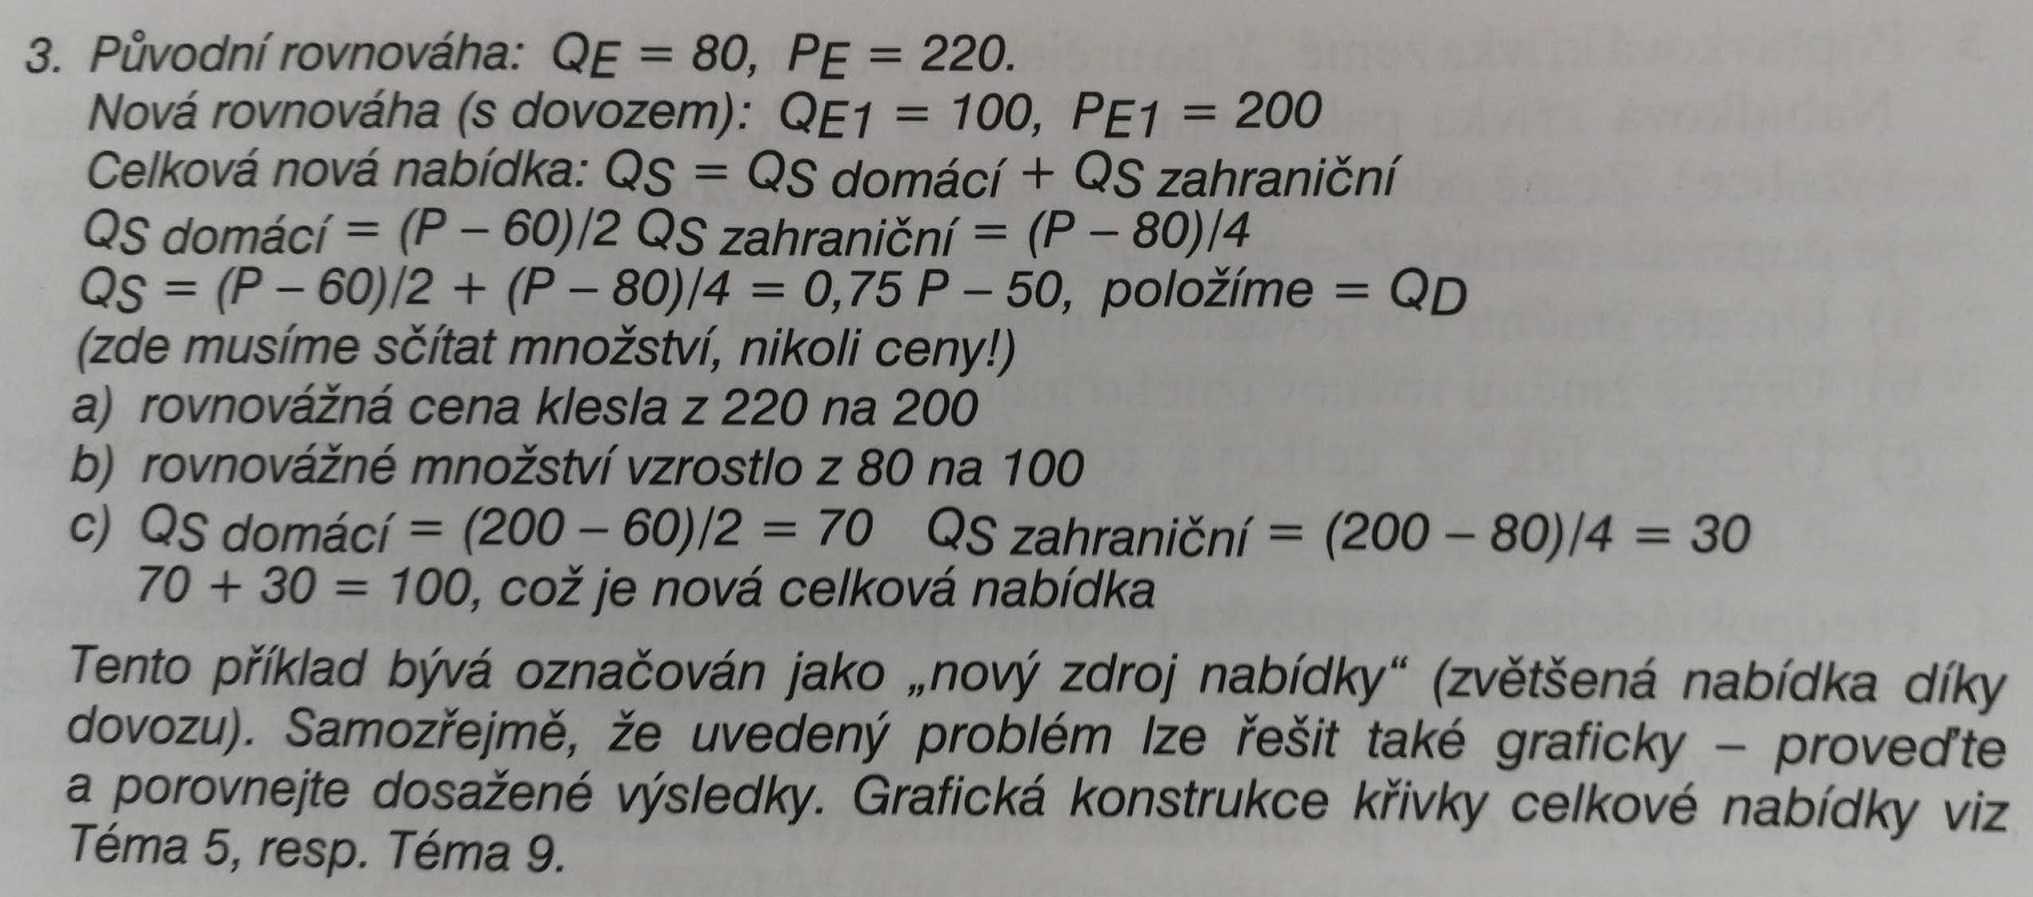 http://forum.matematika.cz/upload3/img/2019-03/79070_IMG_20190312_092305.jpg